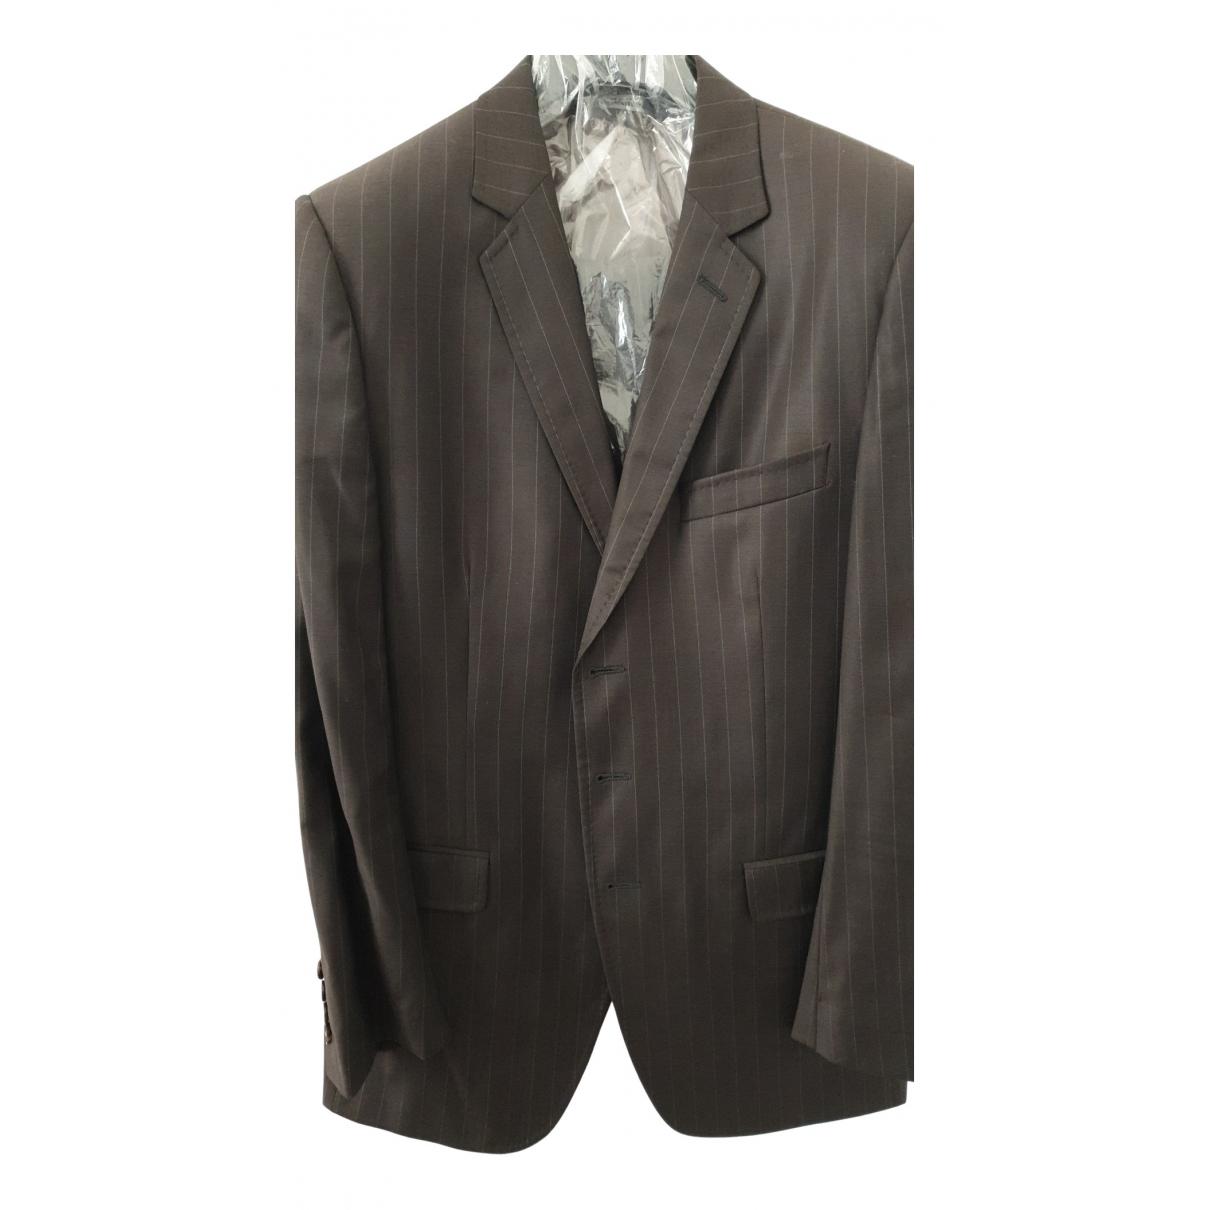 Dolce & Gabbana N Brown Wool Suits for Men L International